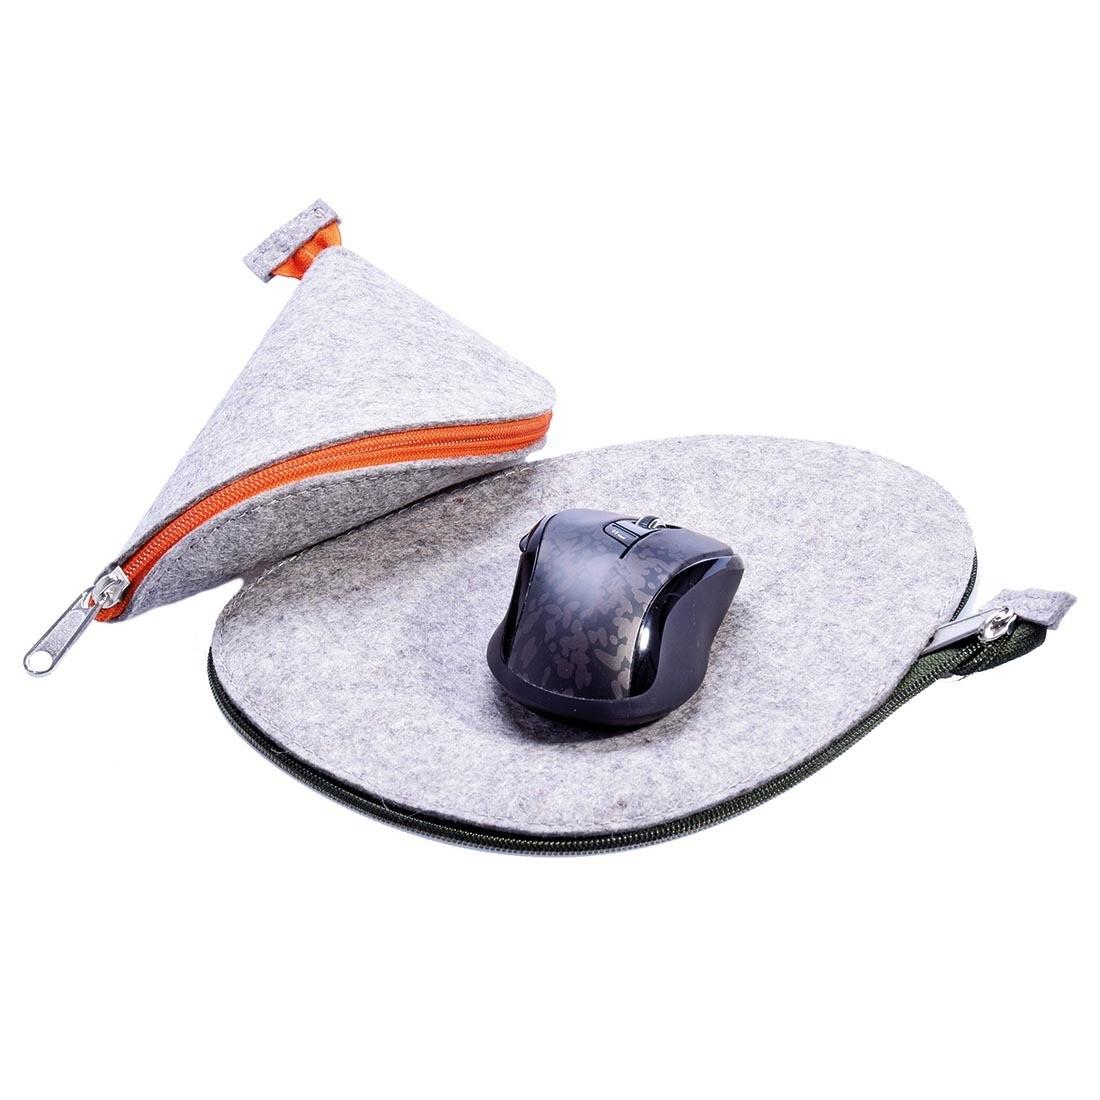 Mousepad & -Euti Moppe